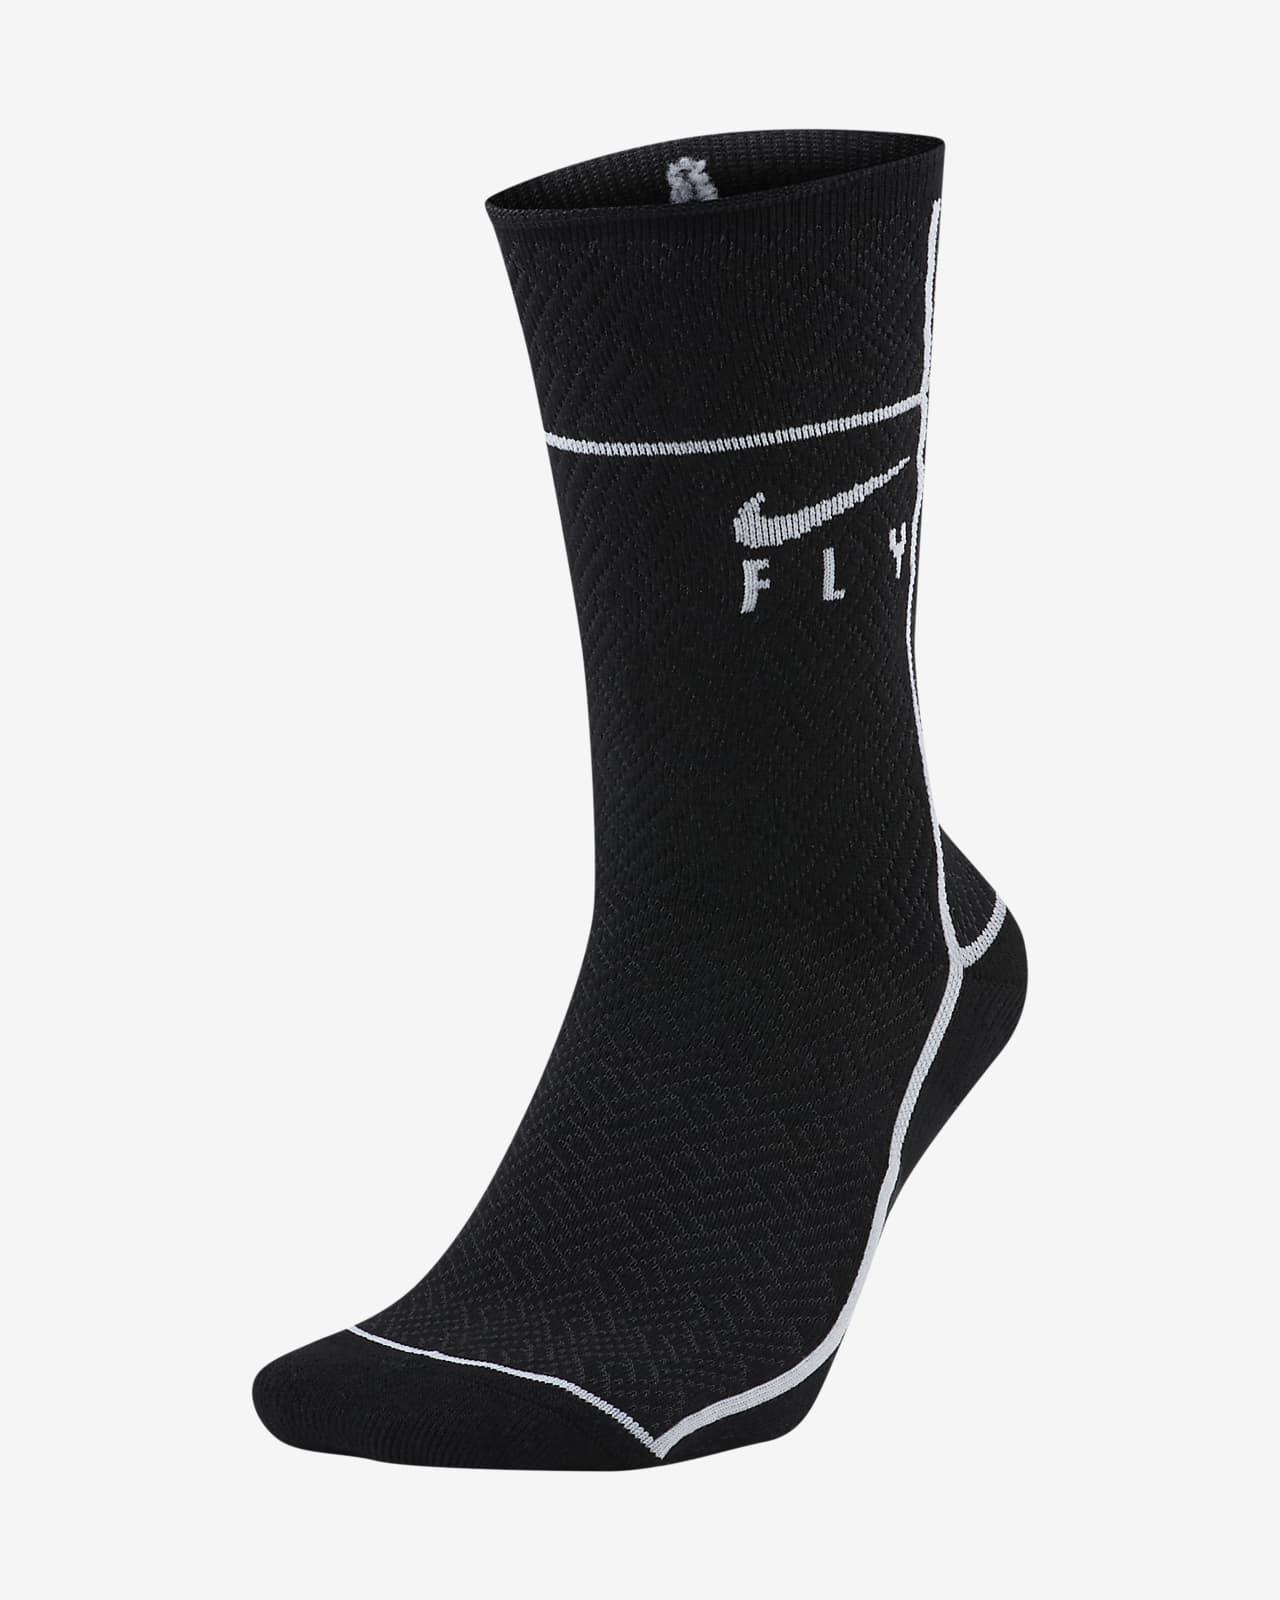 Calcetines largos de básquetbol Nike SNKR SOX Swoosh Fly